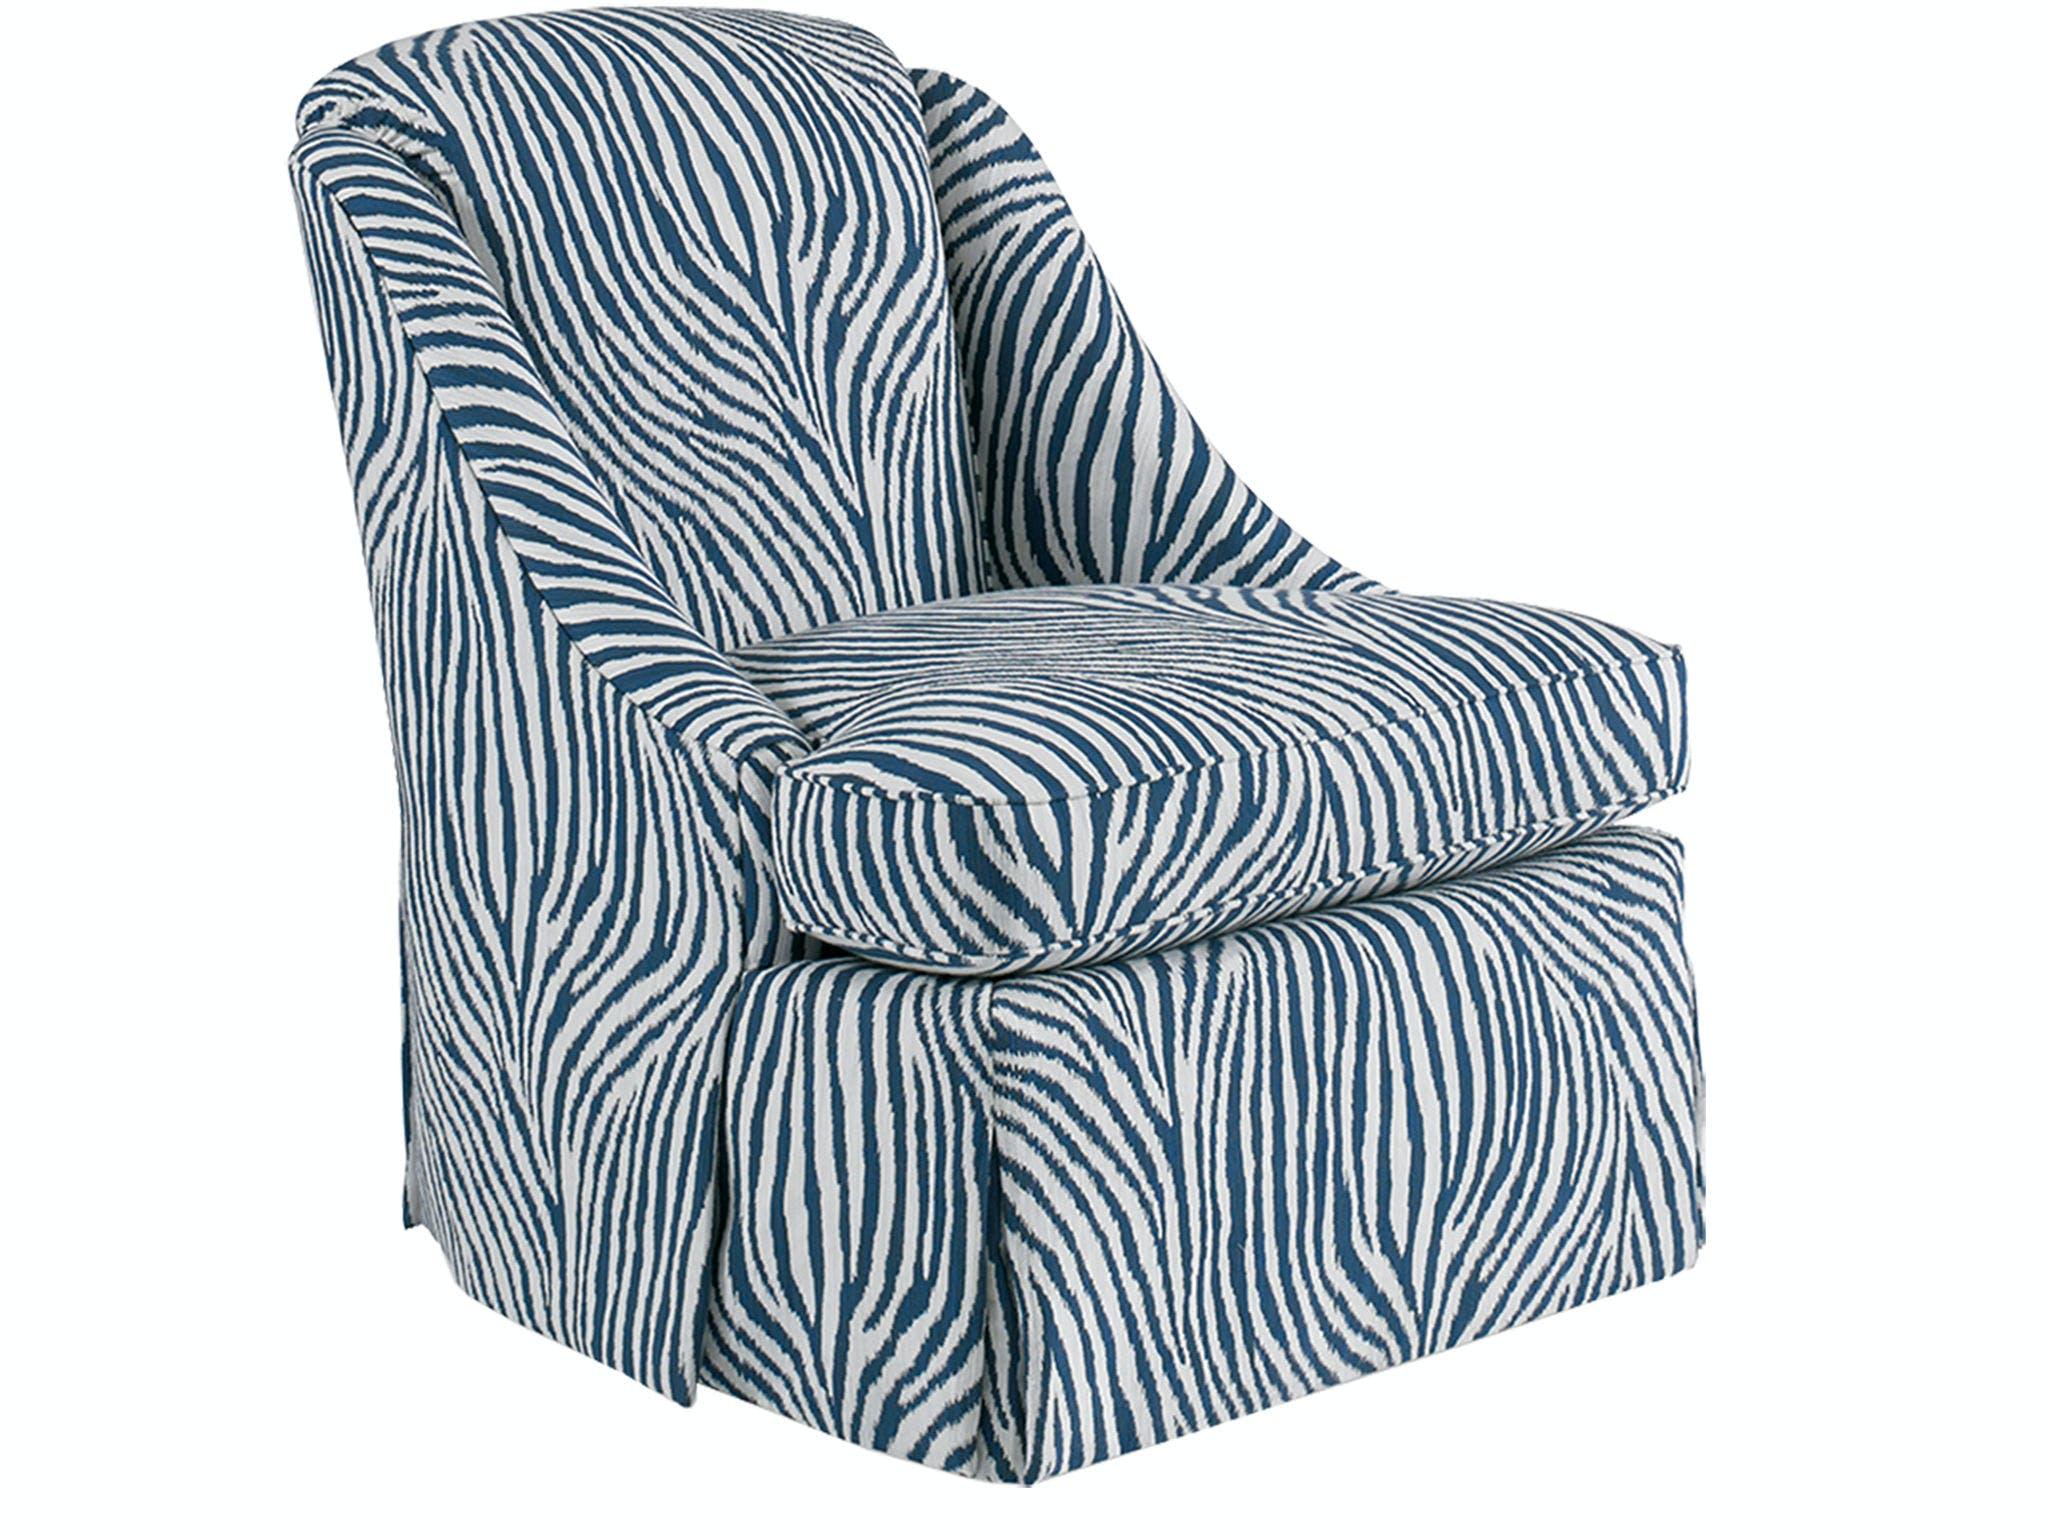 Picture of: Sherrill Living Room Chair Dc227 Mark Thomas Home Santa Clara Ca